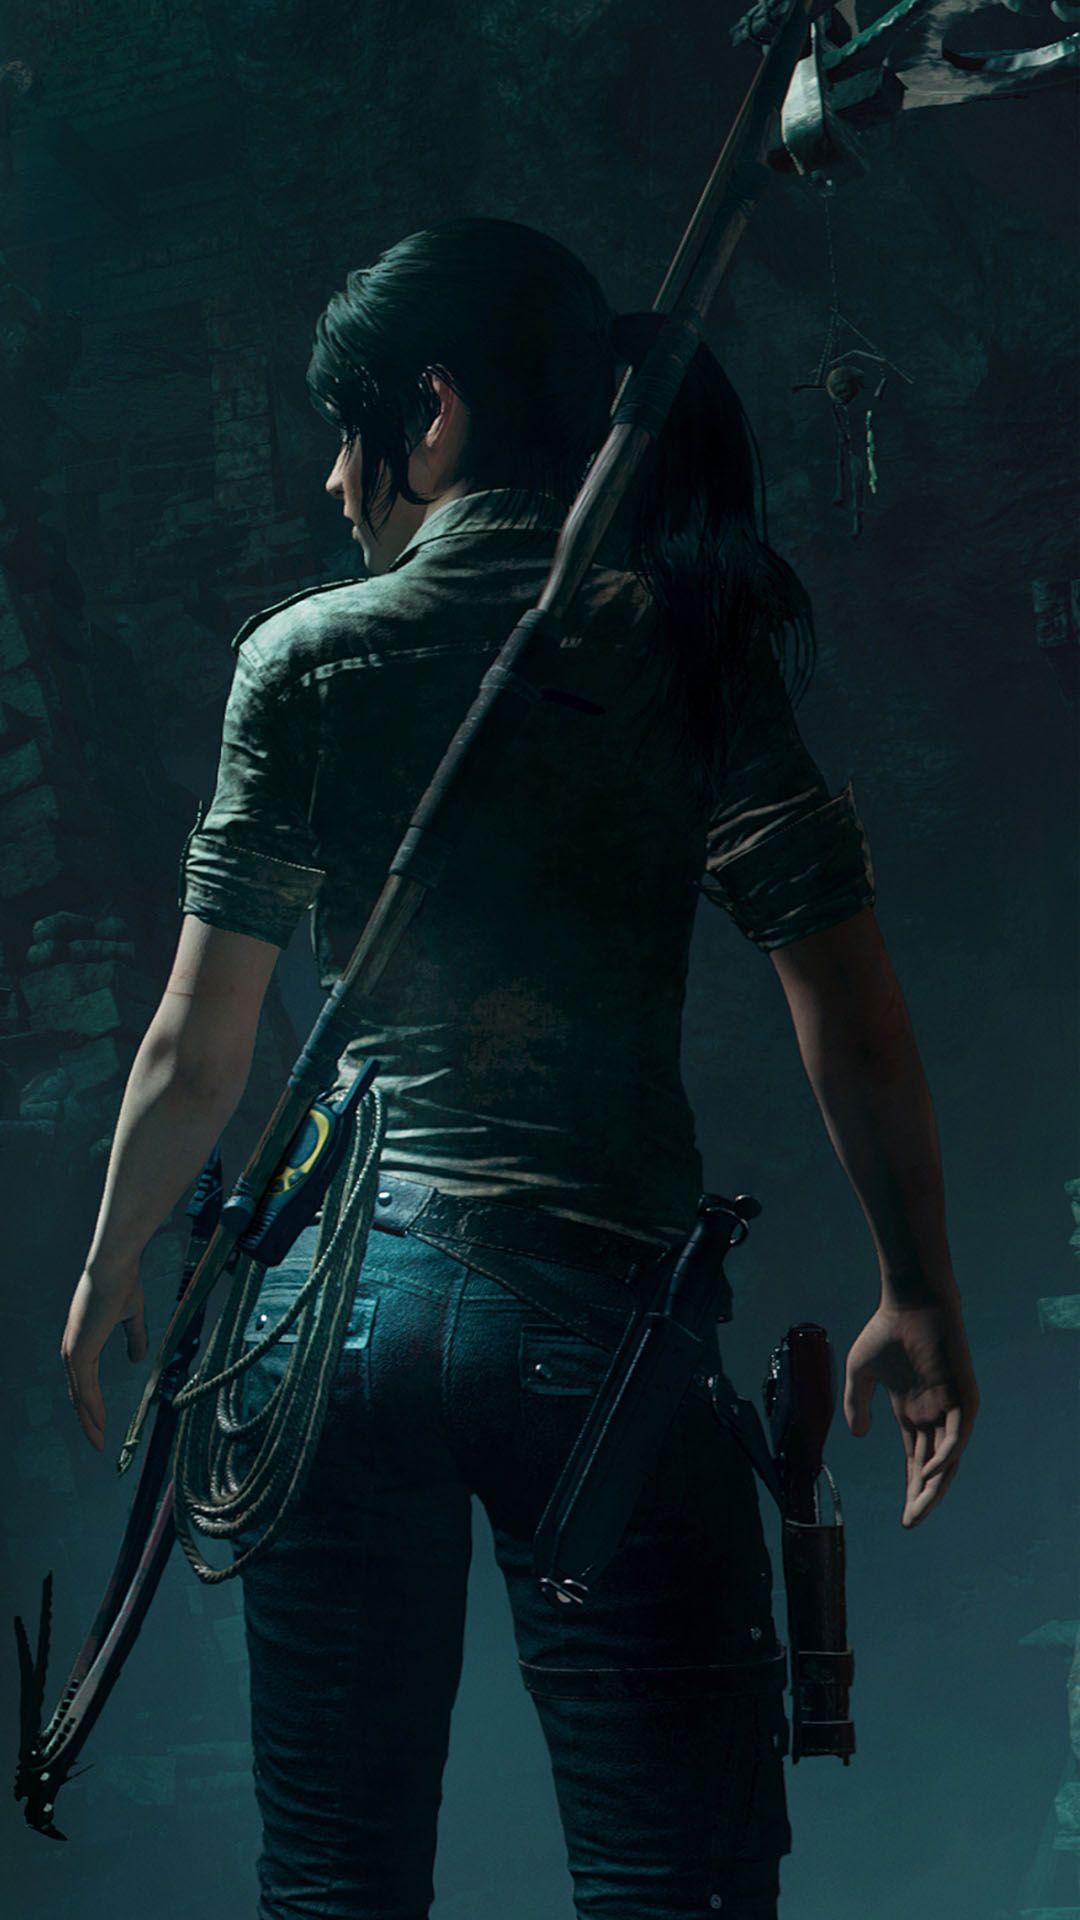 Lara Croft Tomb raider lara croft, Tomb raider, Tomb